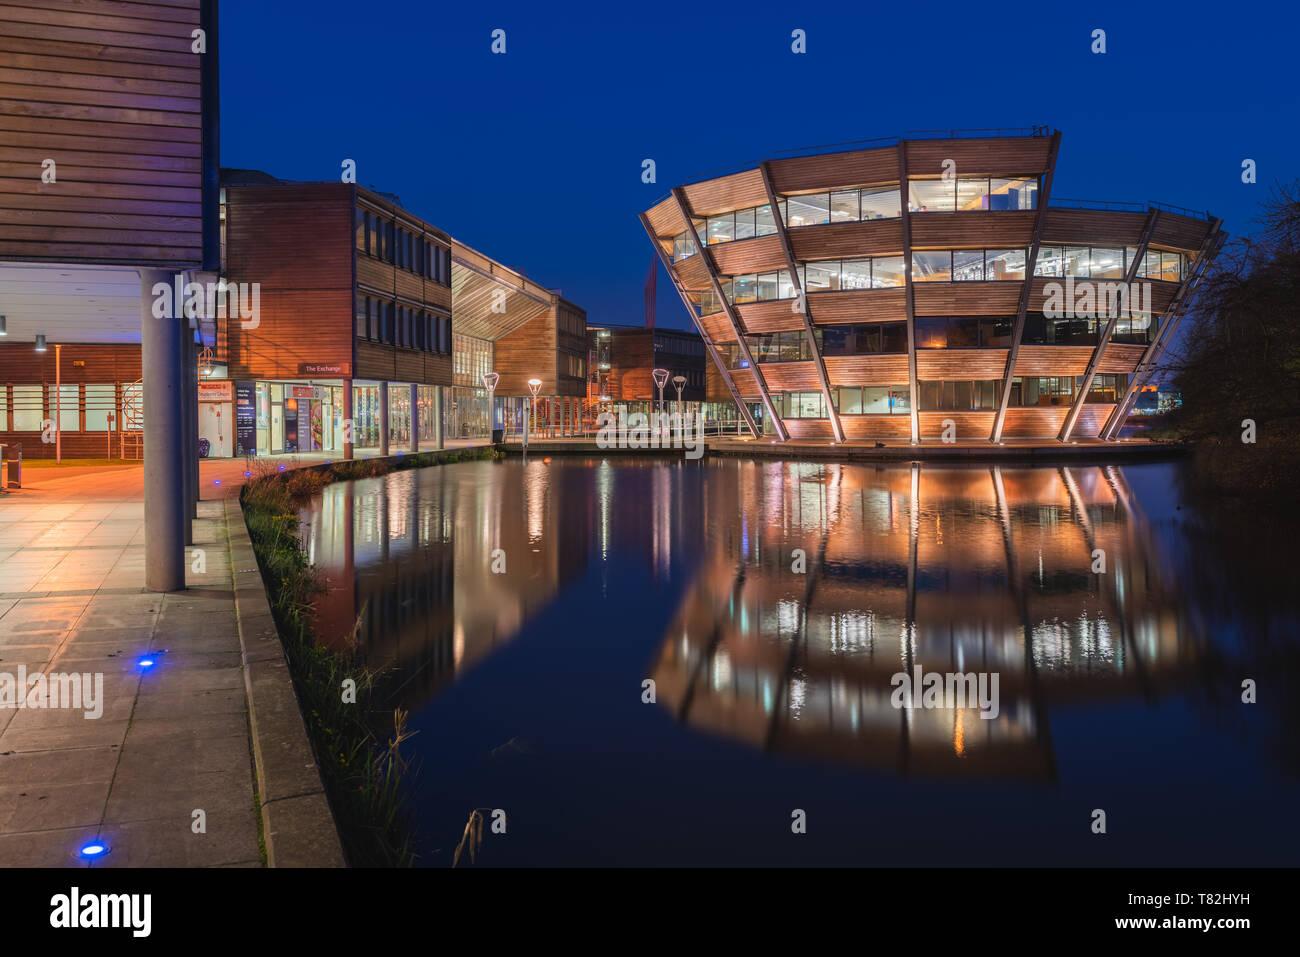 University of Nottingham Jubilee Campus in England. - Stock Image